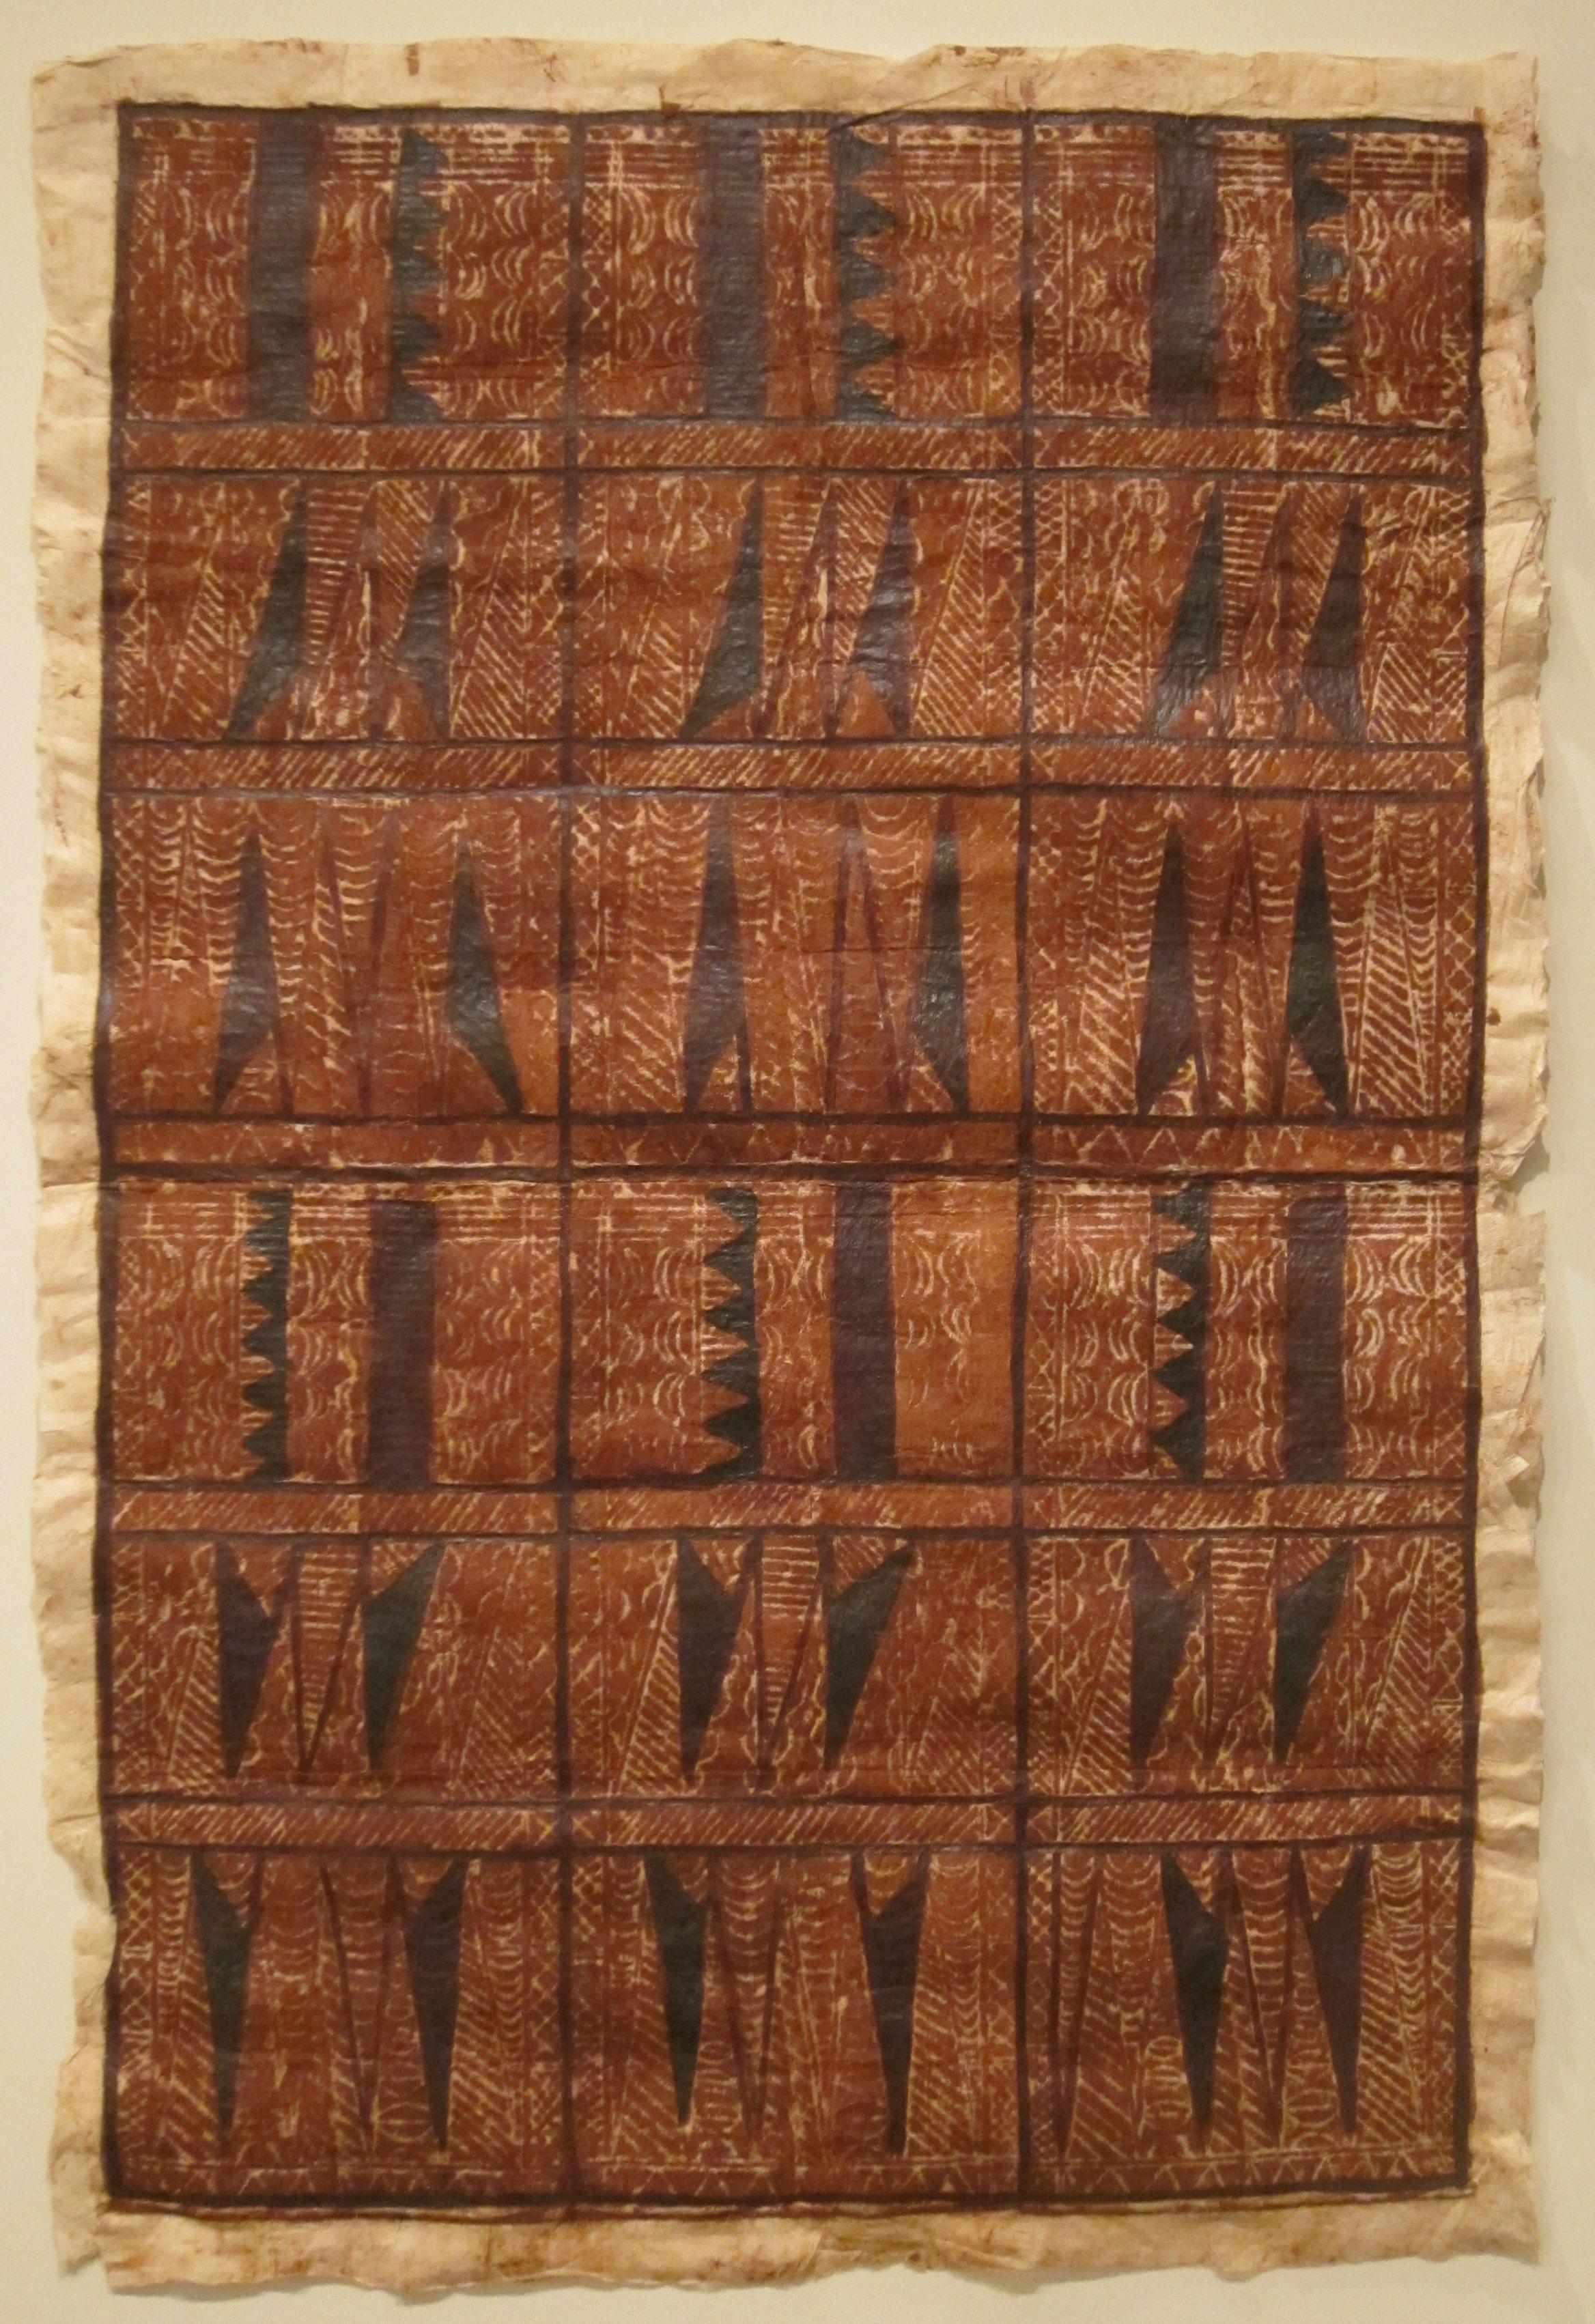 File:Siapo 'elei (bark cloth) from Samoa, 20th century ...